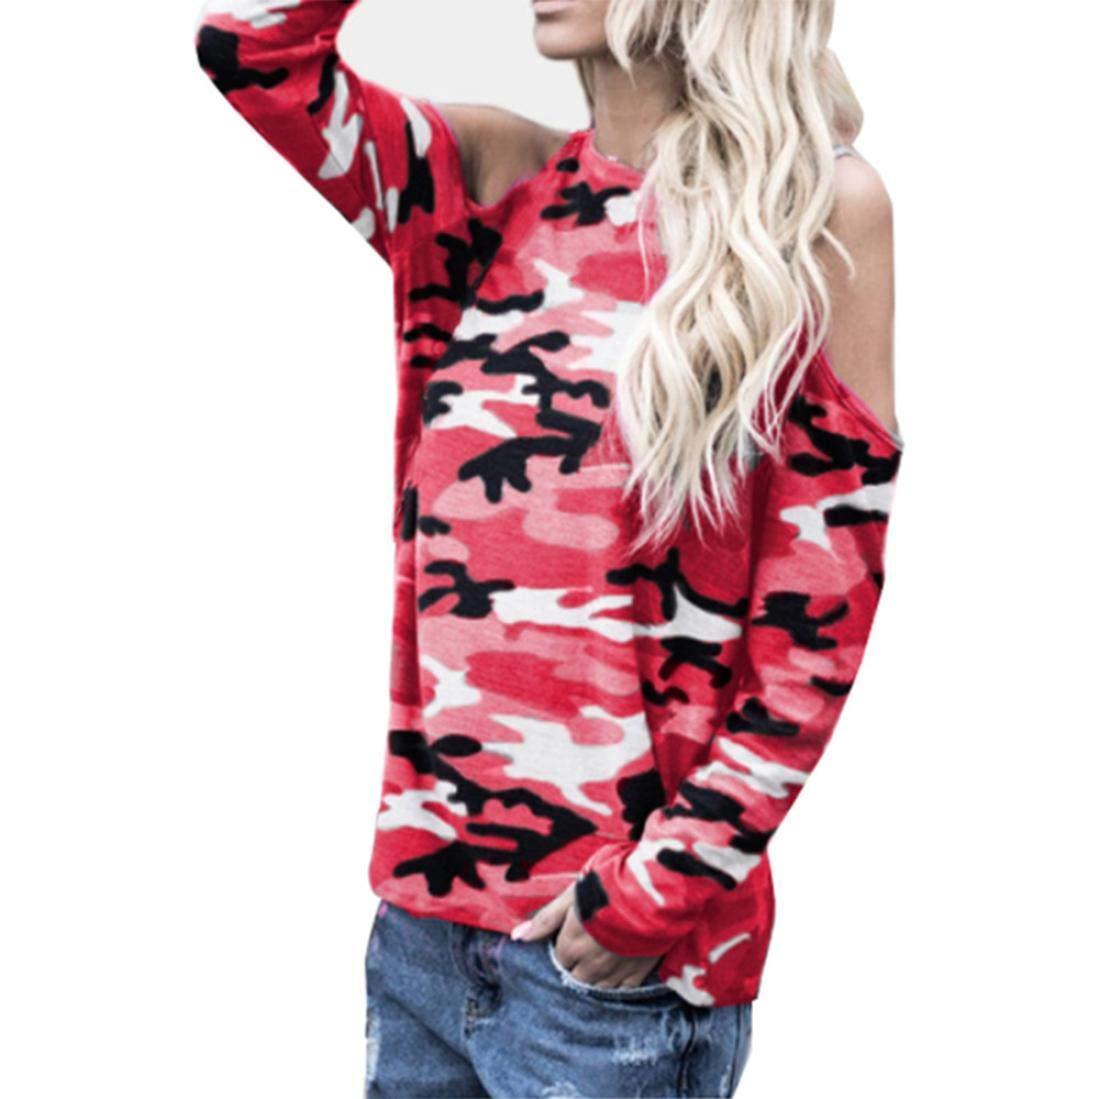 Laimeng_world Clothes SHIRT ガールズ B07G8GFDH2 ホットピンク Medium